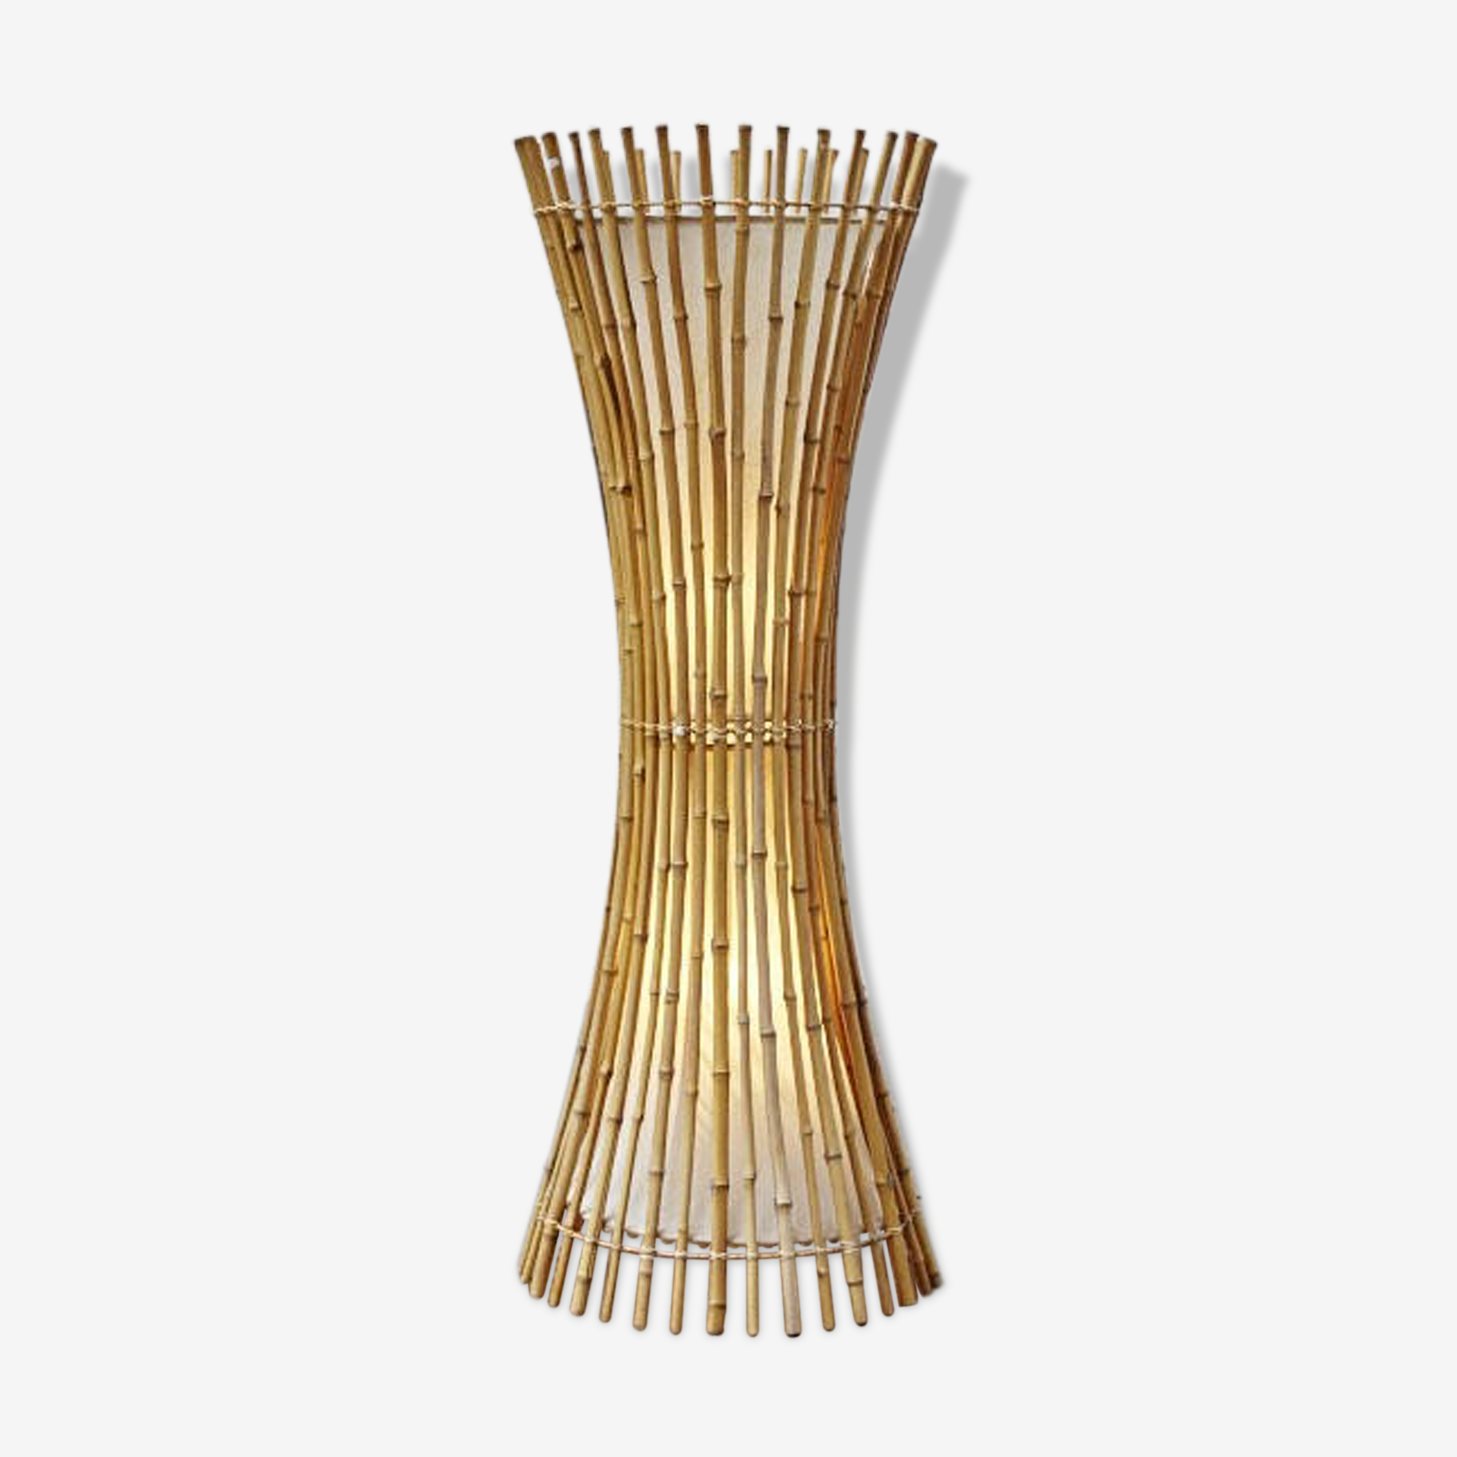 Lampadaire italien en bambou